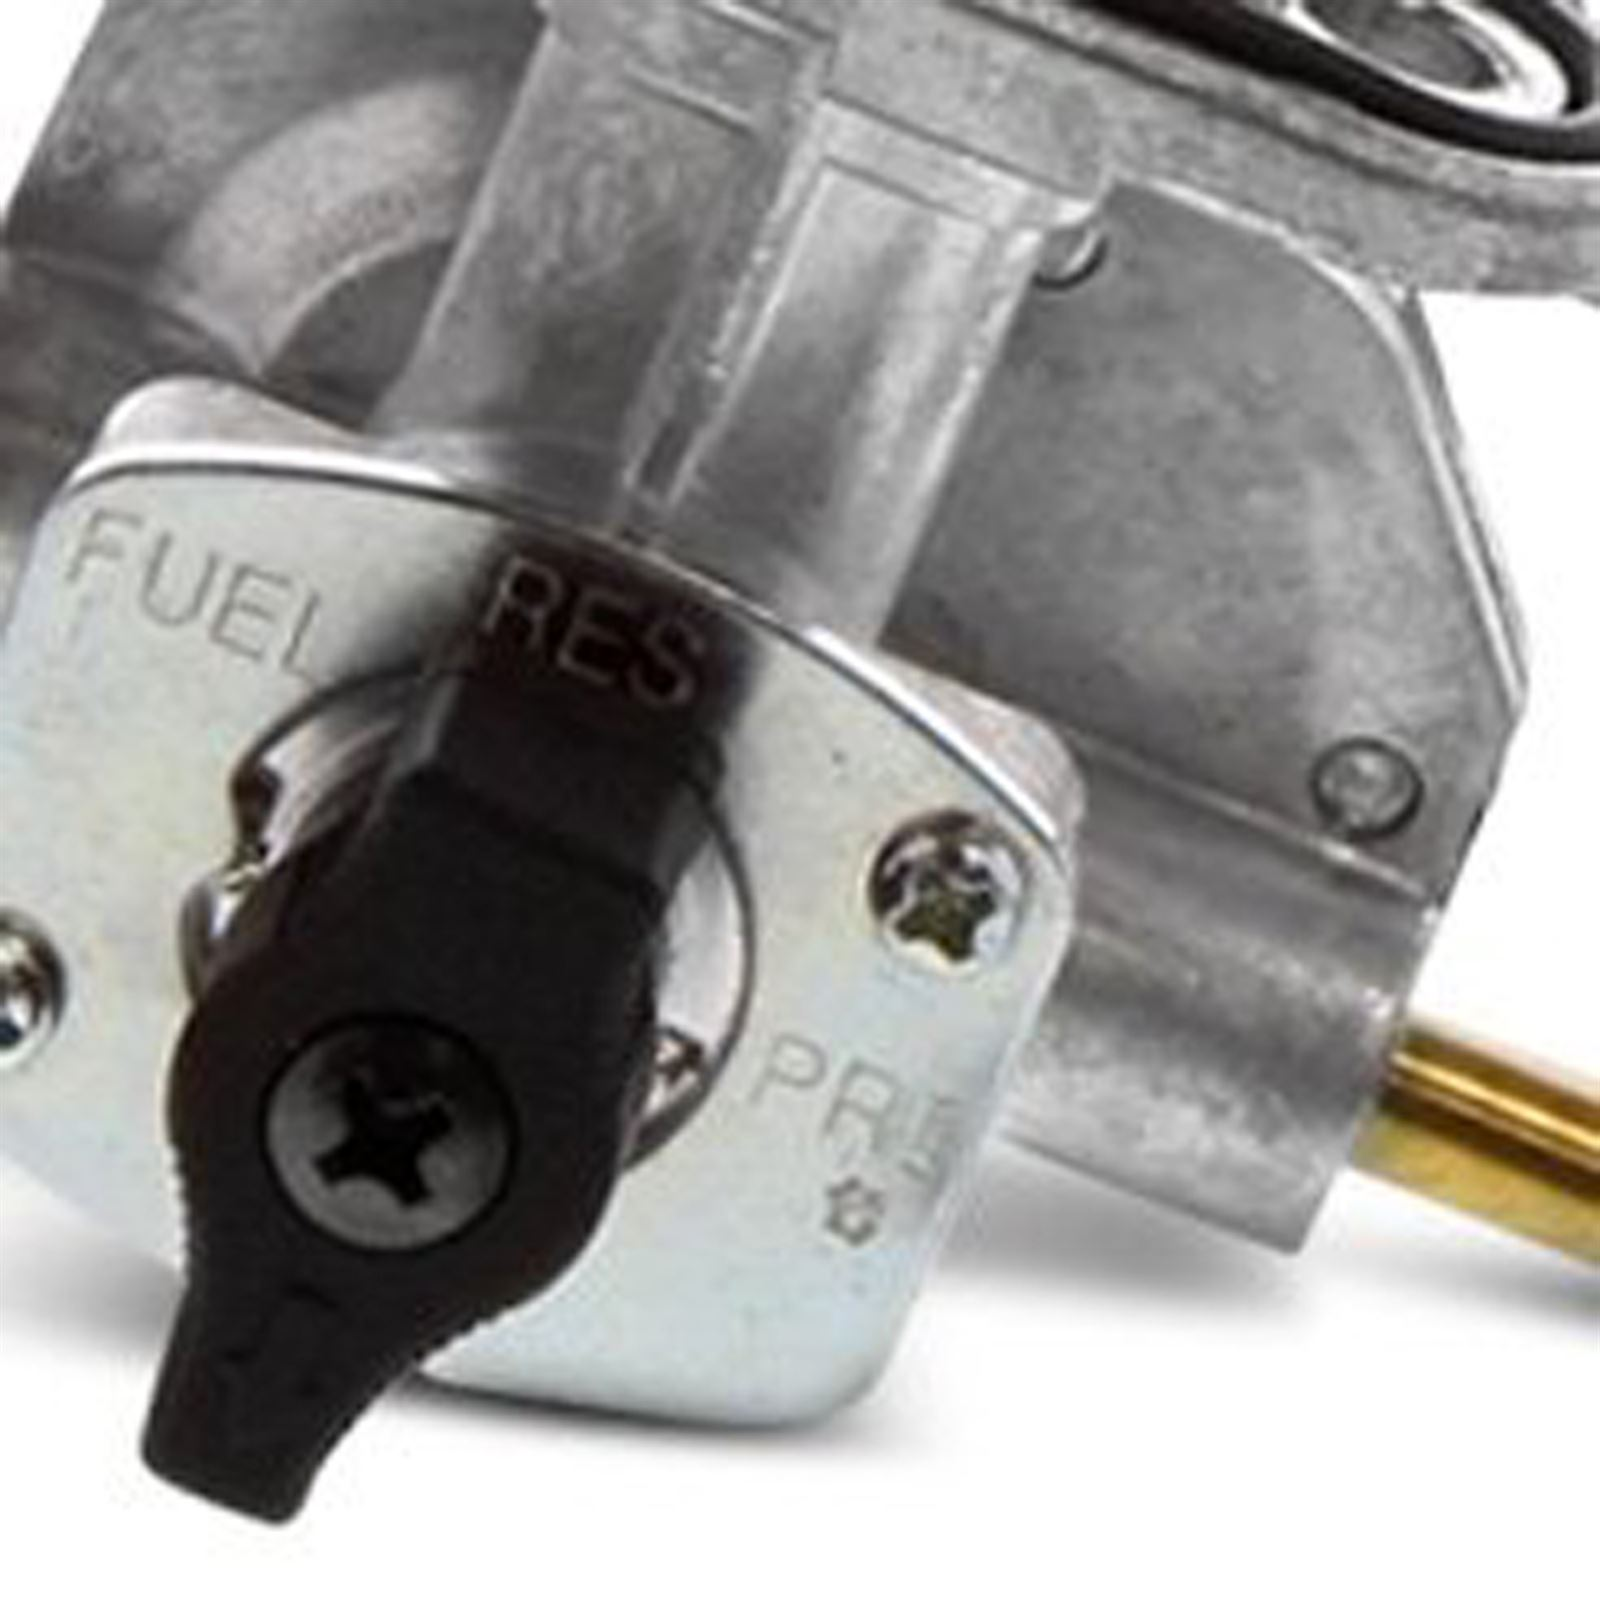 Fuel Star Fuel Valve